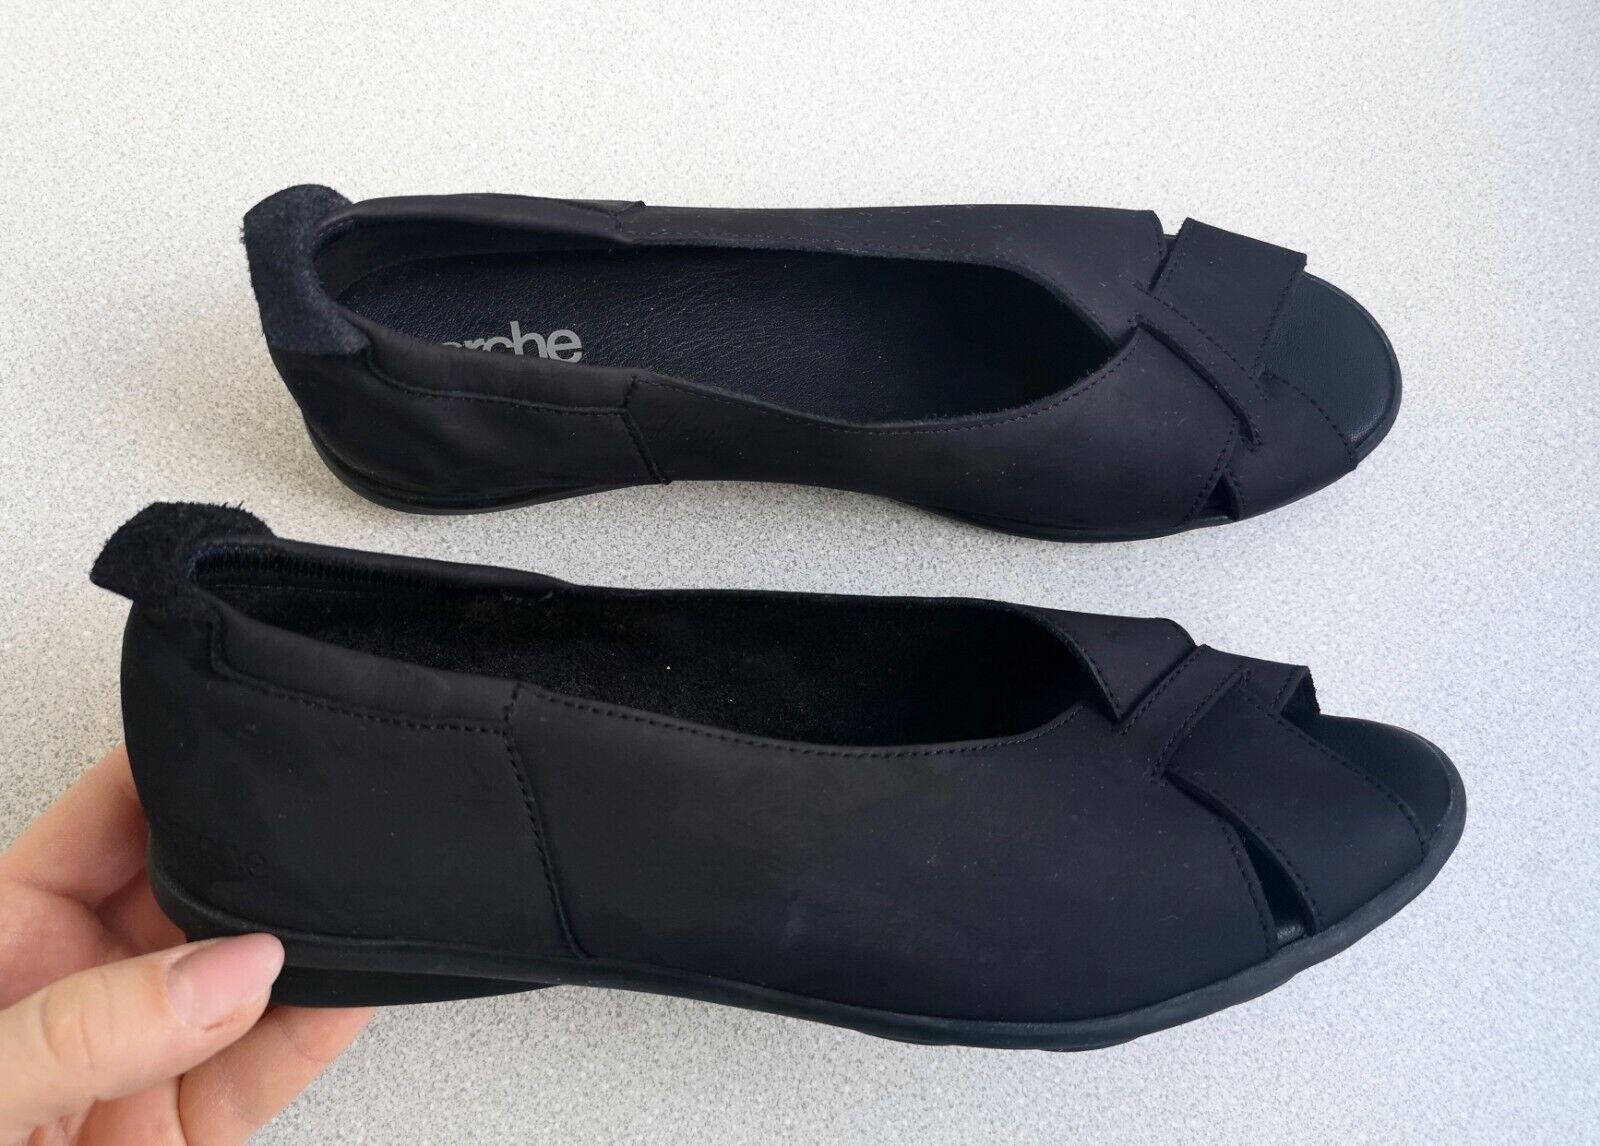 Arche Negro Gamuza Cuña Punta Abierta Zapatos Sandalias Francia EU40